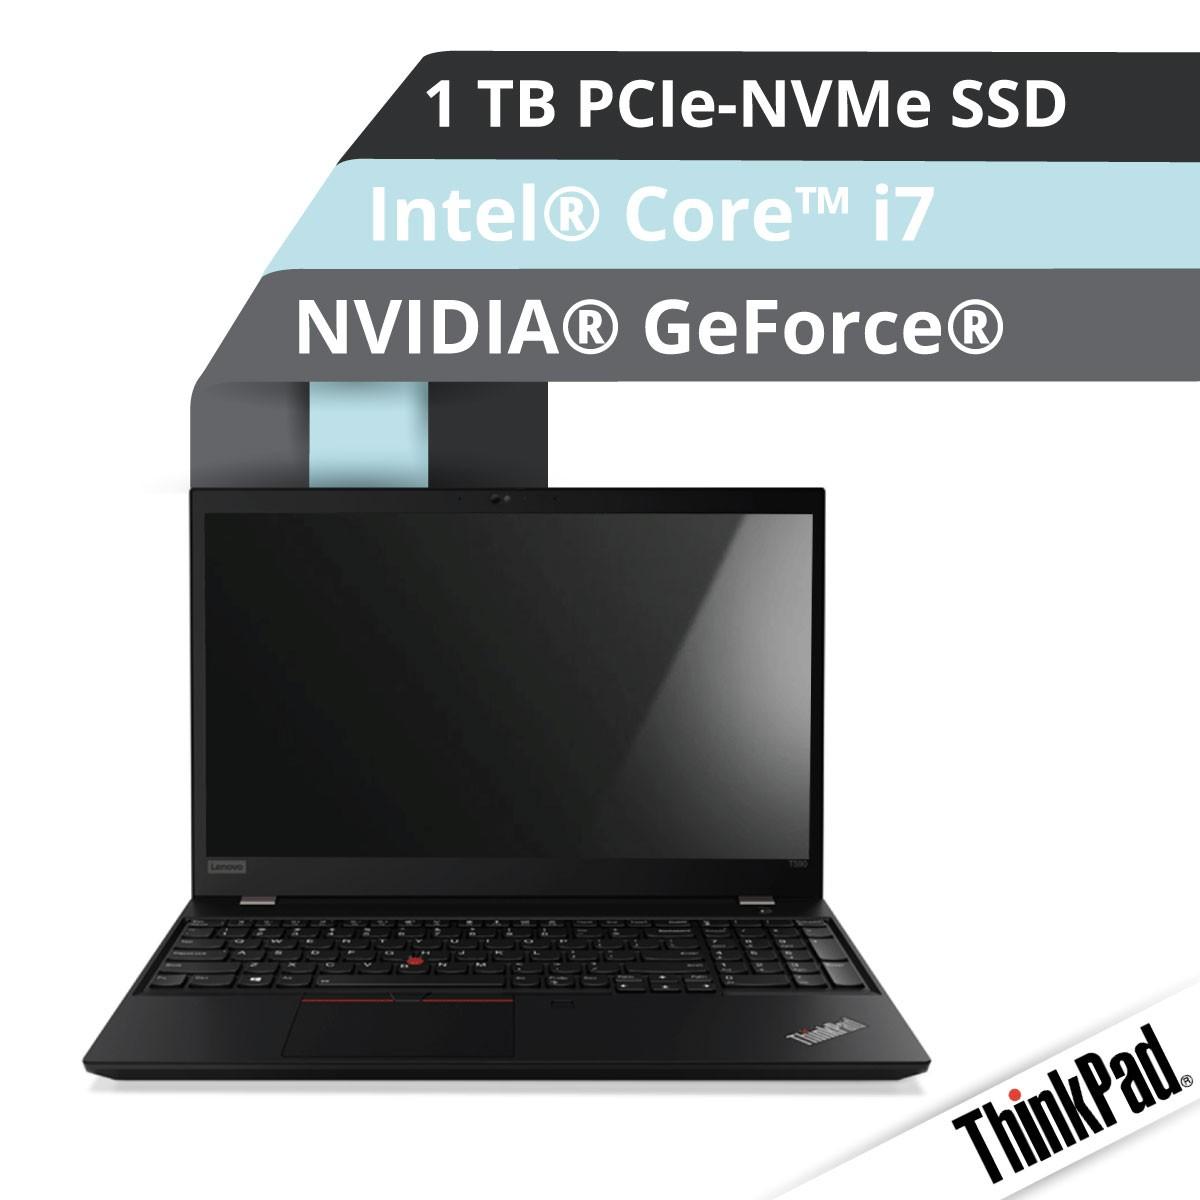 Lenovo™ ThinkPad® T590 Notebook Modell 20N4-002U